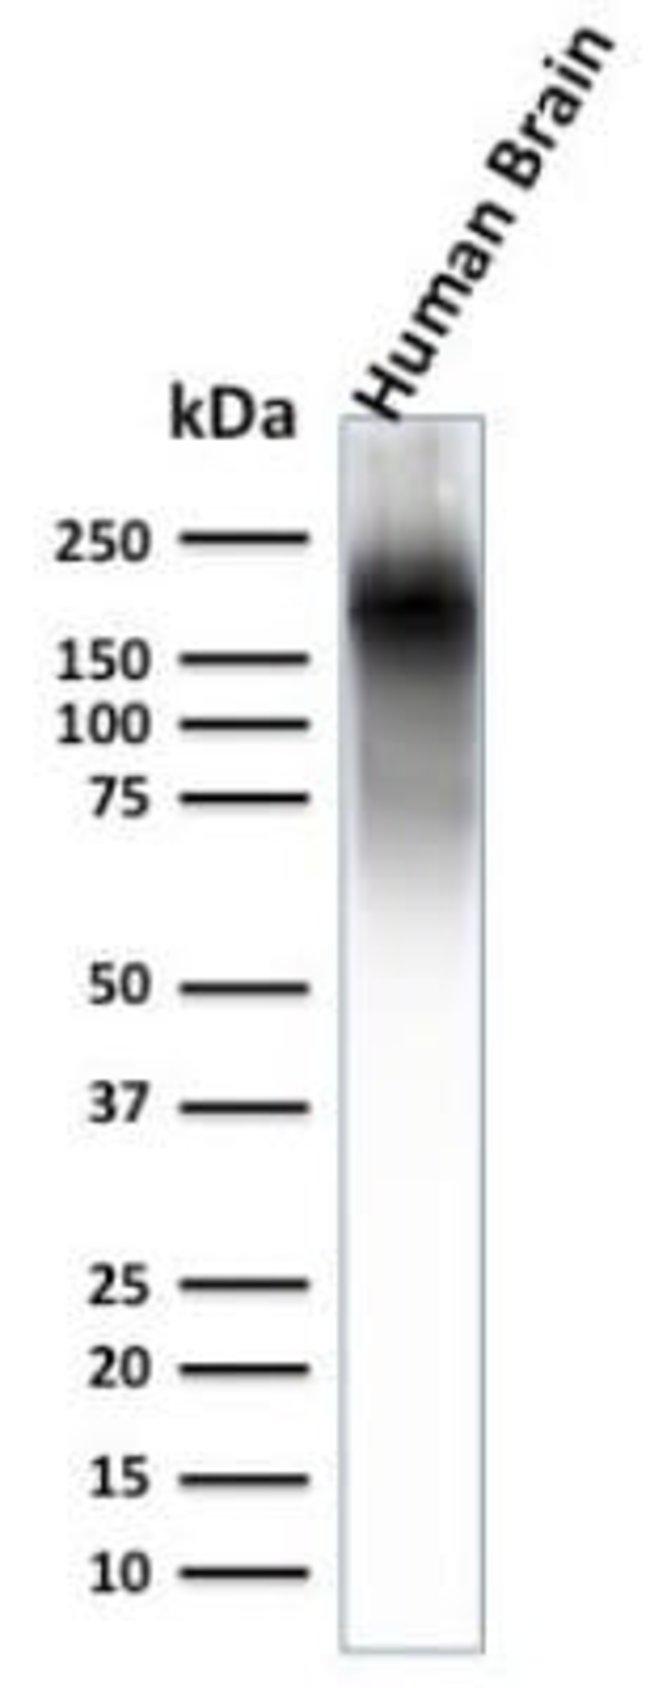 NF-H Rabbit anti-Human, Mouse, Rat, Porcine, Chicken, Clone: NEFL.H/2324R,